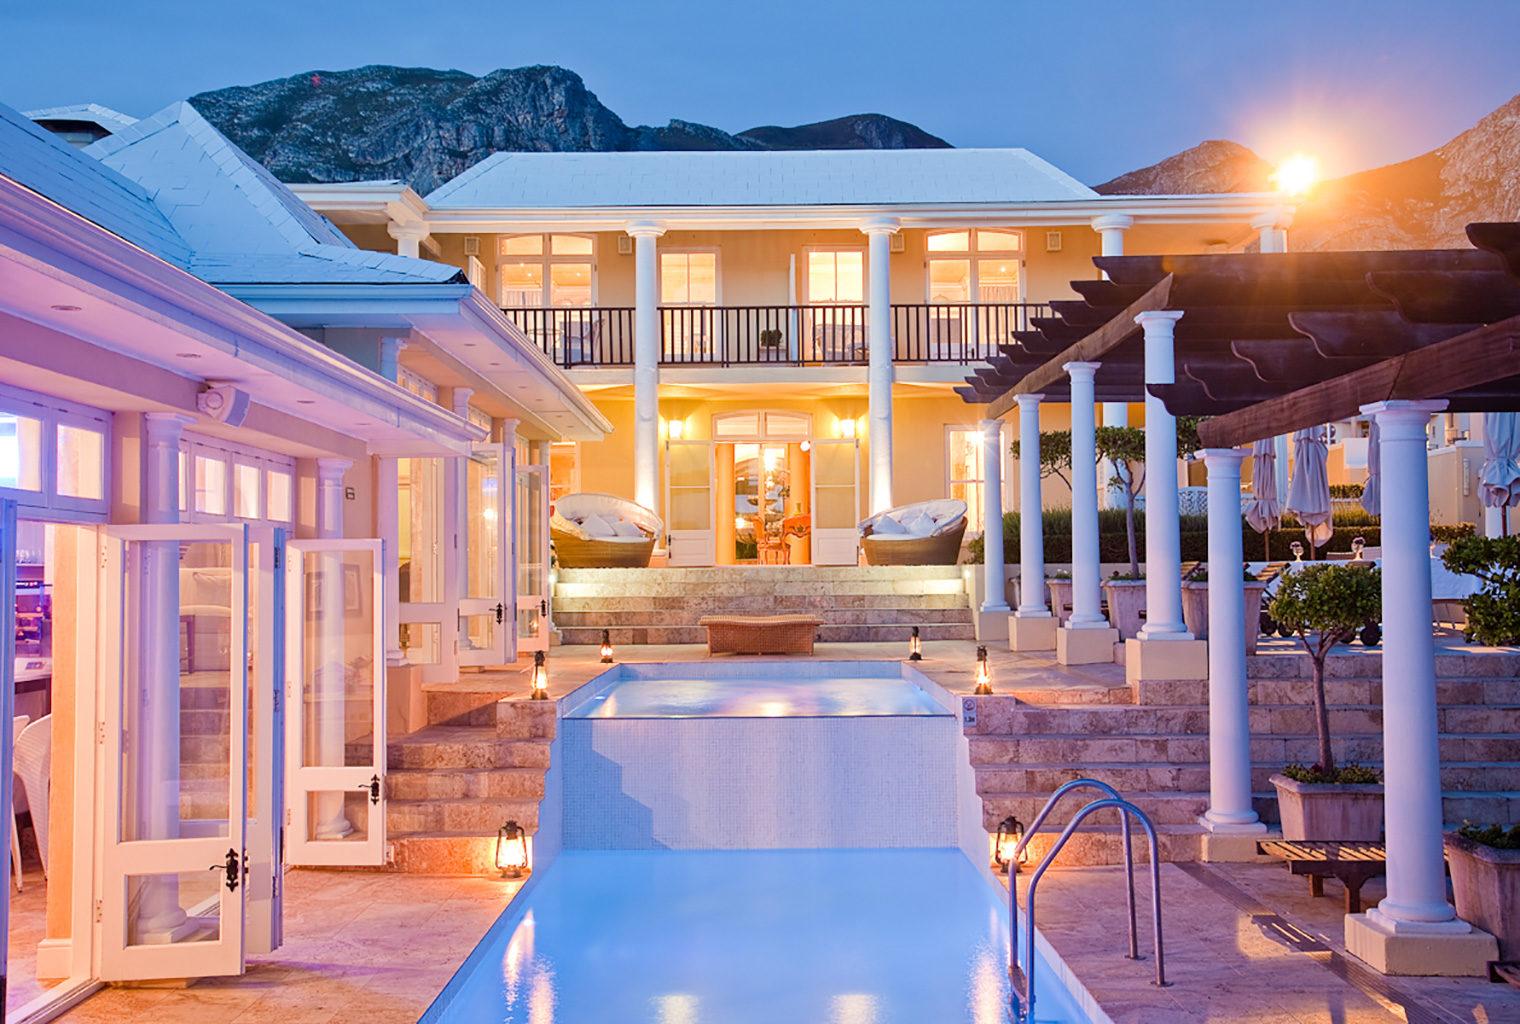 Birkenhead-House-South-Africa-Pool-Courtyard